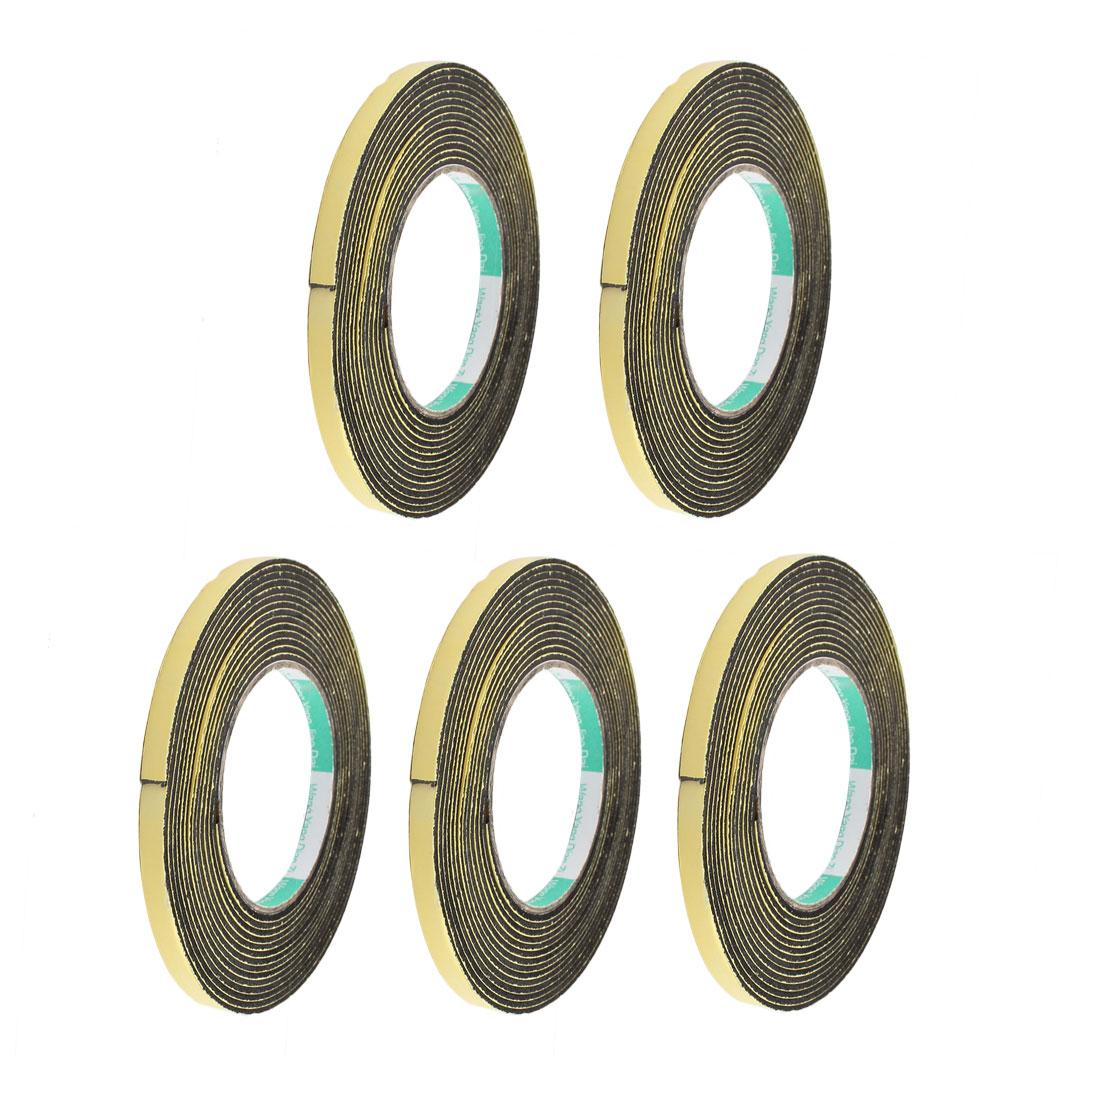 5Pcs 8mm Width 2mm Thick Single Sided Sealing Shockproof Sponge Tape 5m Length